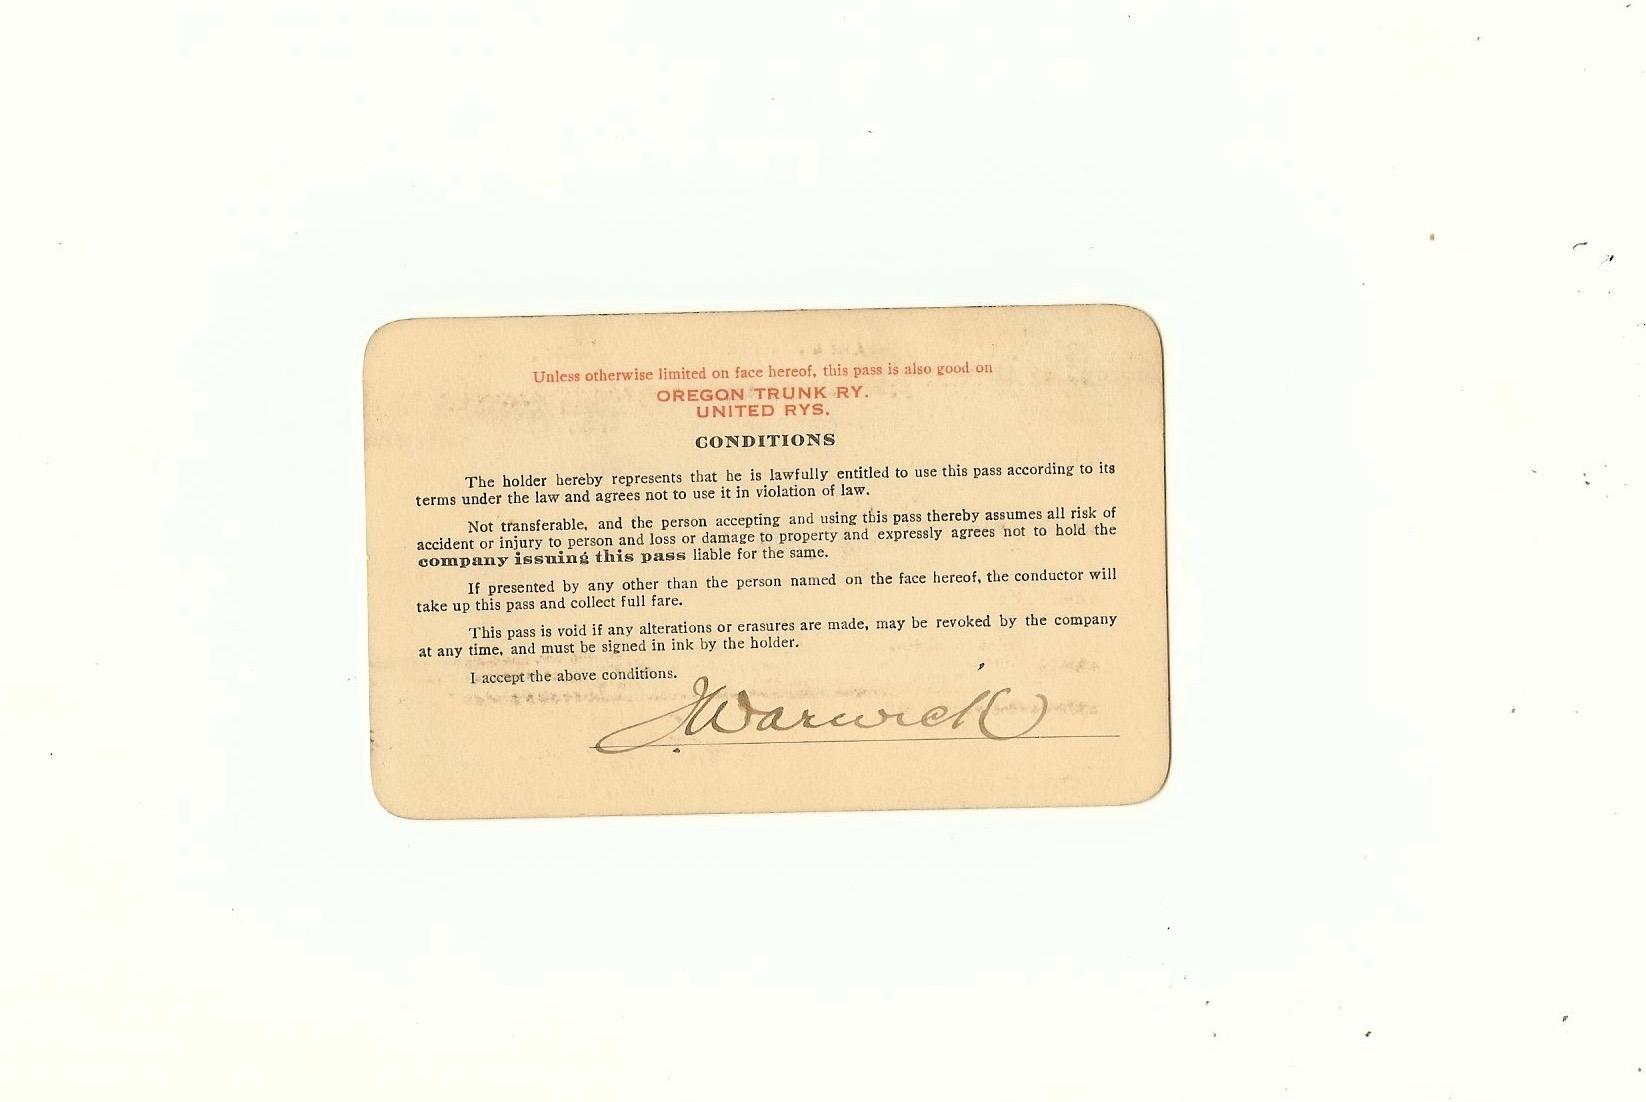 Spokane, Portland & Seattle Railway Pass 1917